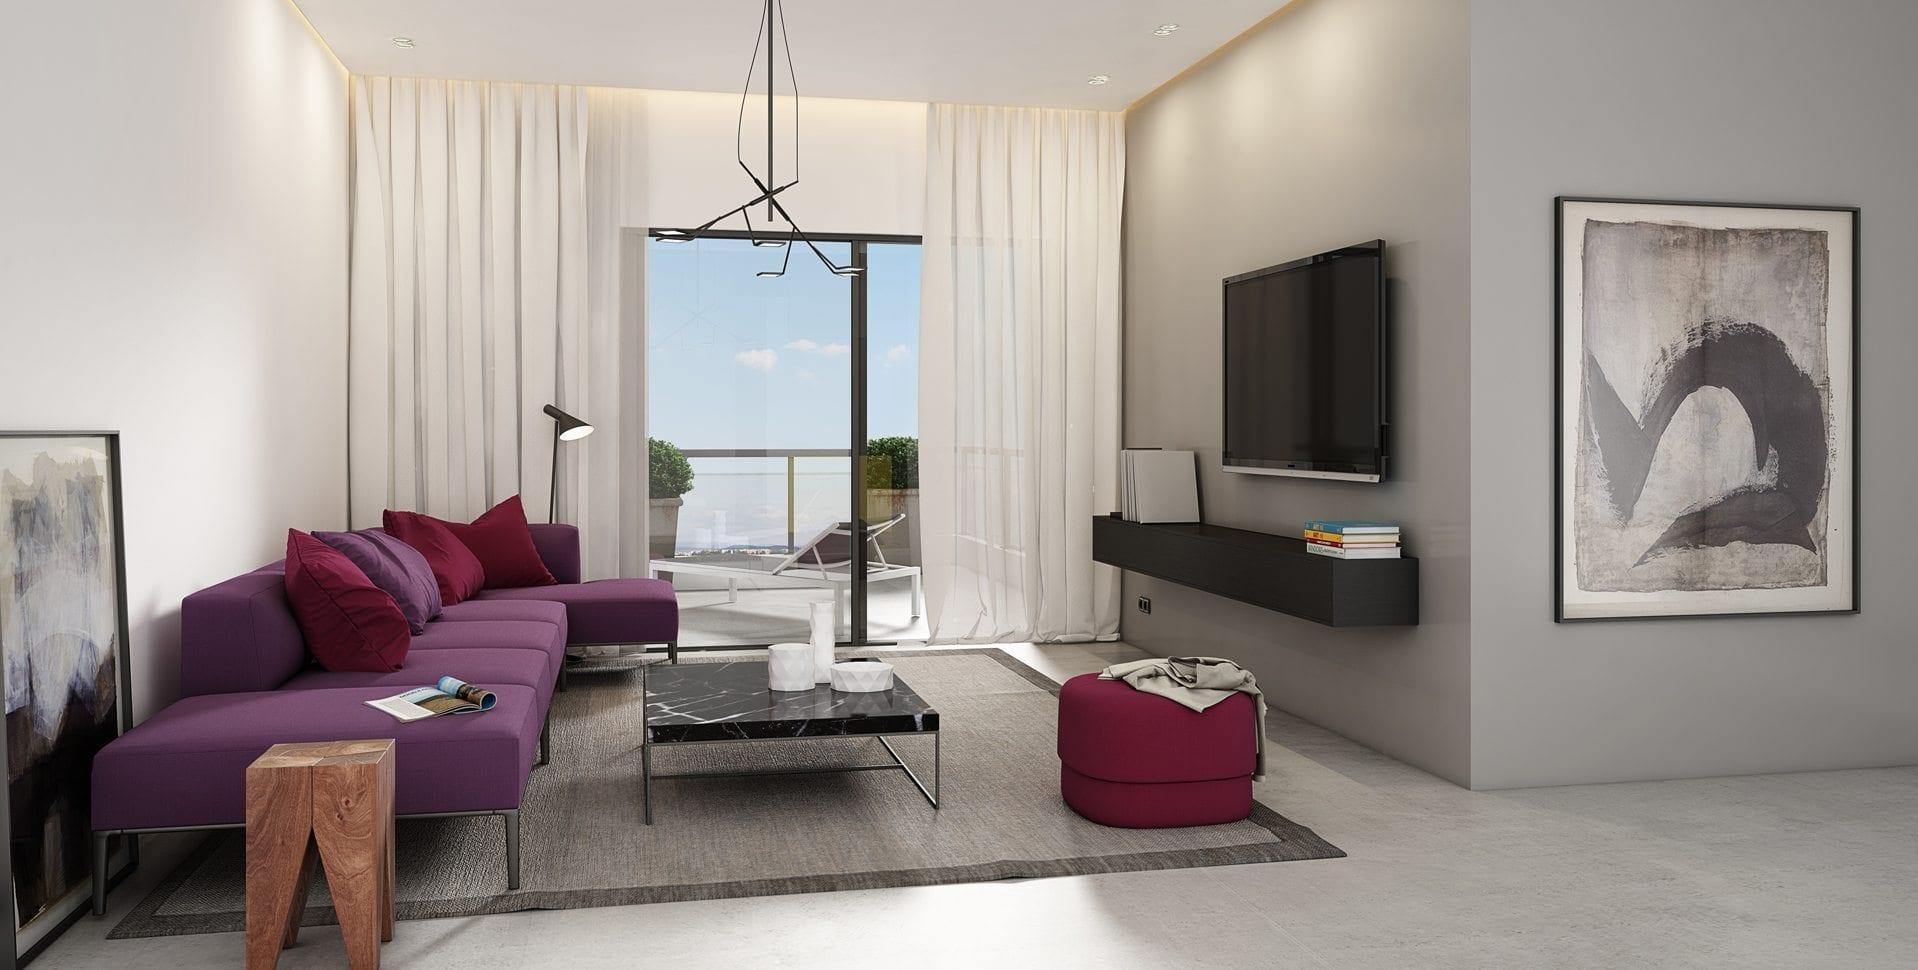 Maayan-Golan_Architectural-Visualization_ apartment-interior-visualization_living-room_company-agam-tavor_project-home-premium_01